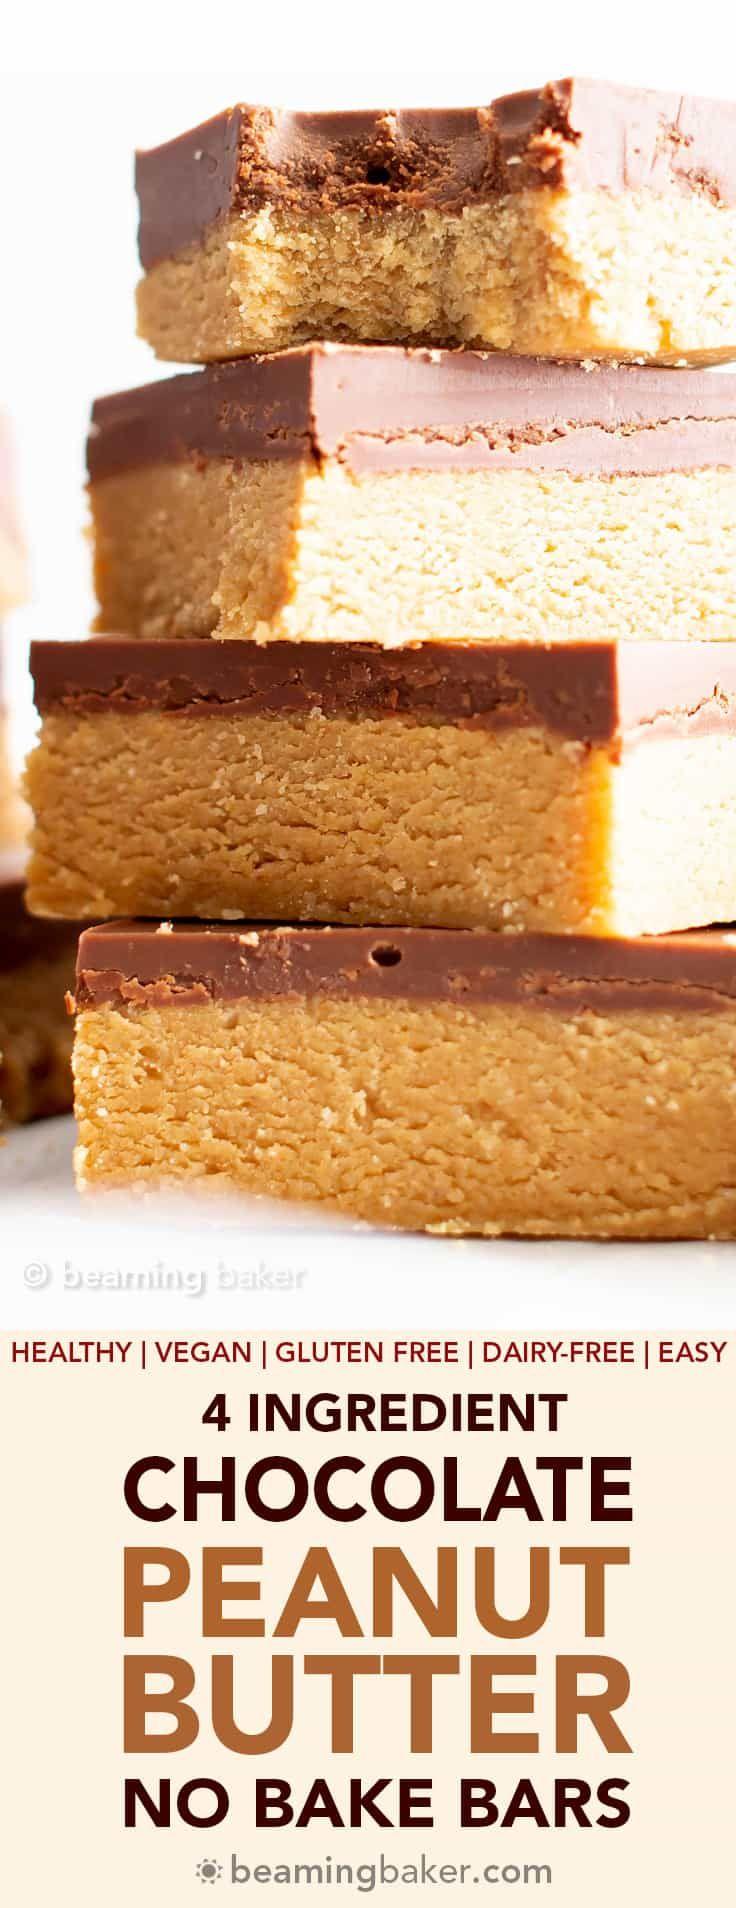 4 Ingredient Easy Vegan Chocolate Peanut Butter Ba…